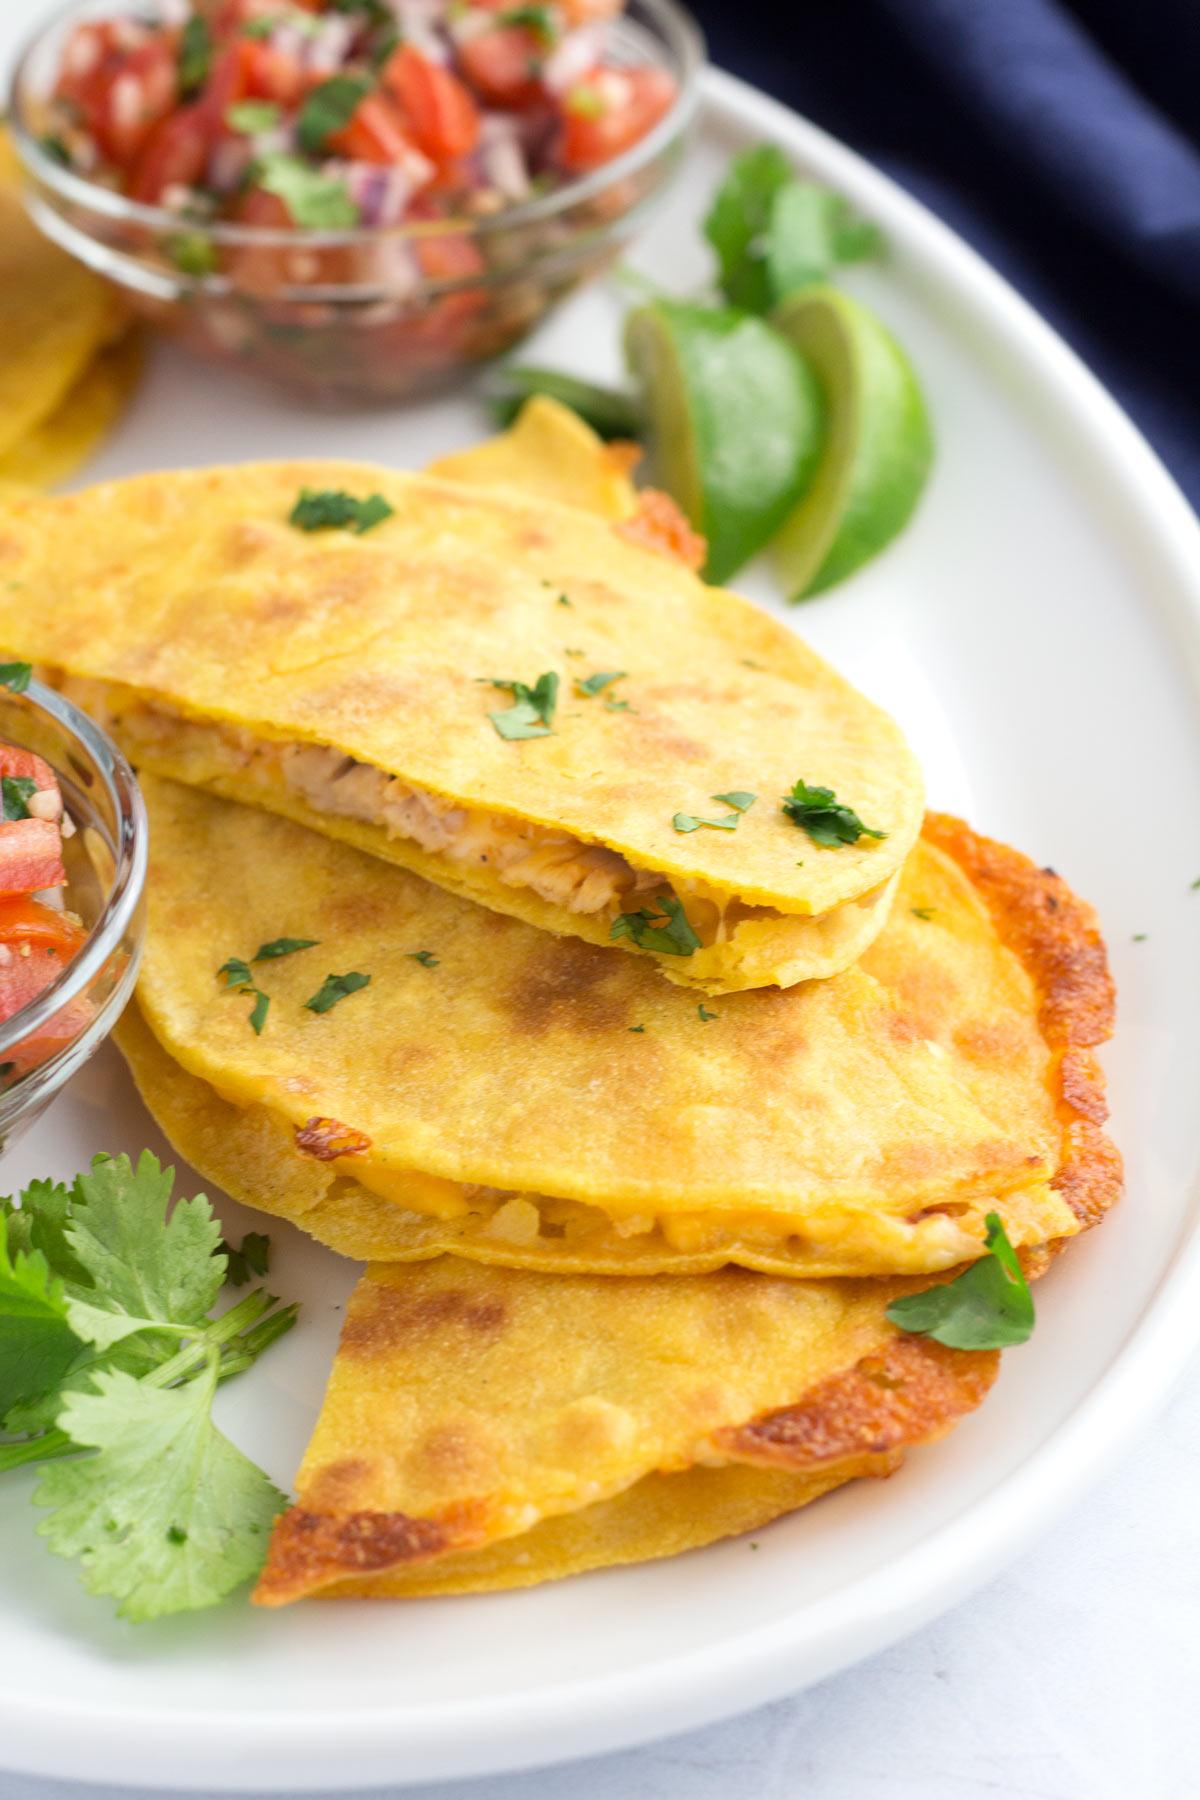 Half pieces of a quesadilla made with corn tortillas on a platter with pico de gallo.